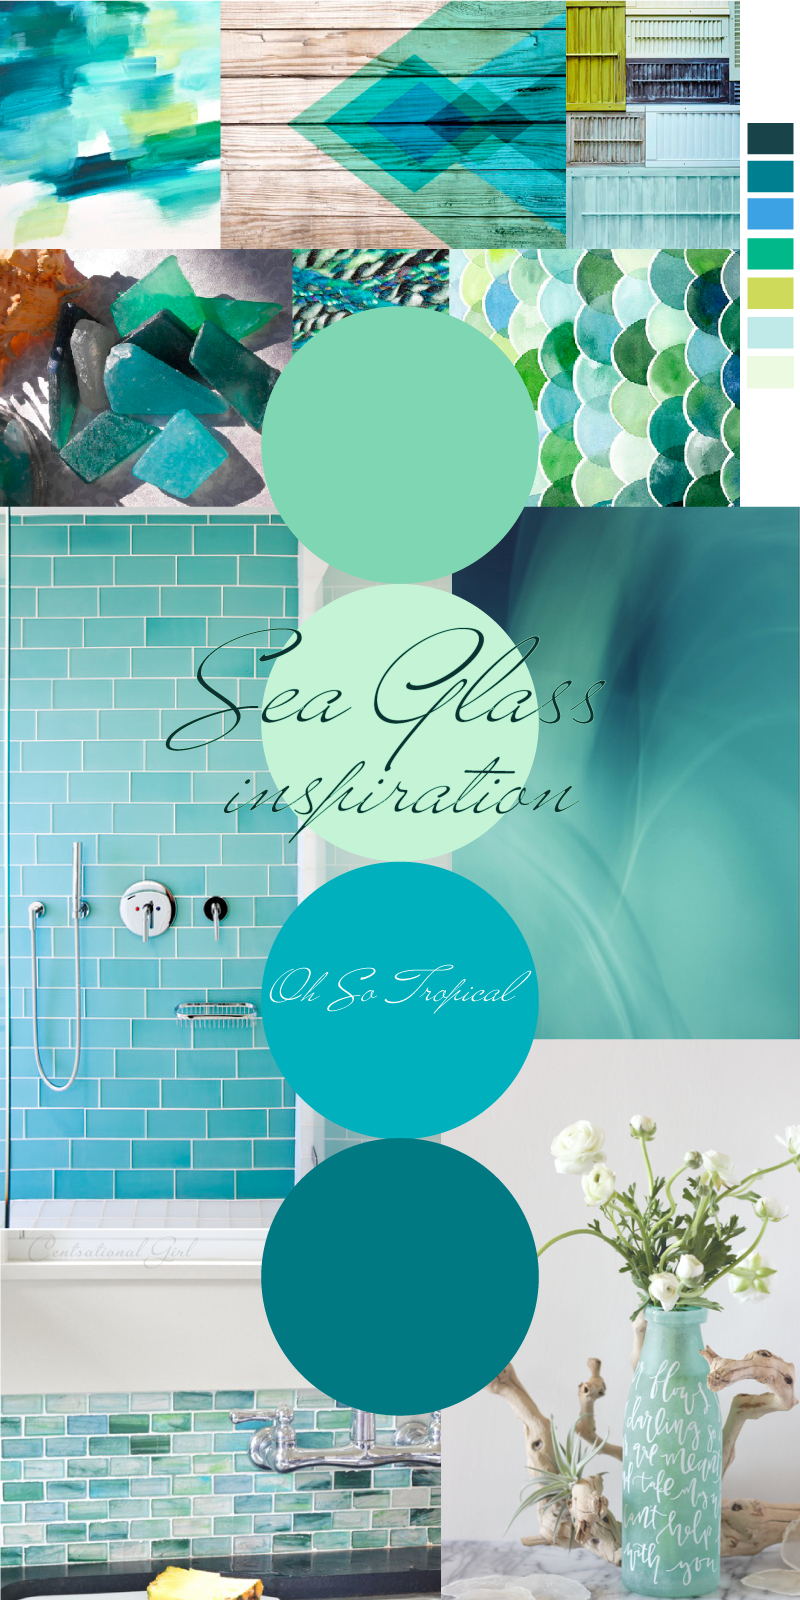 Tropical Colors For Home Interior: Sea Glass Inspiration - Oh So Tropical